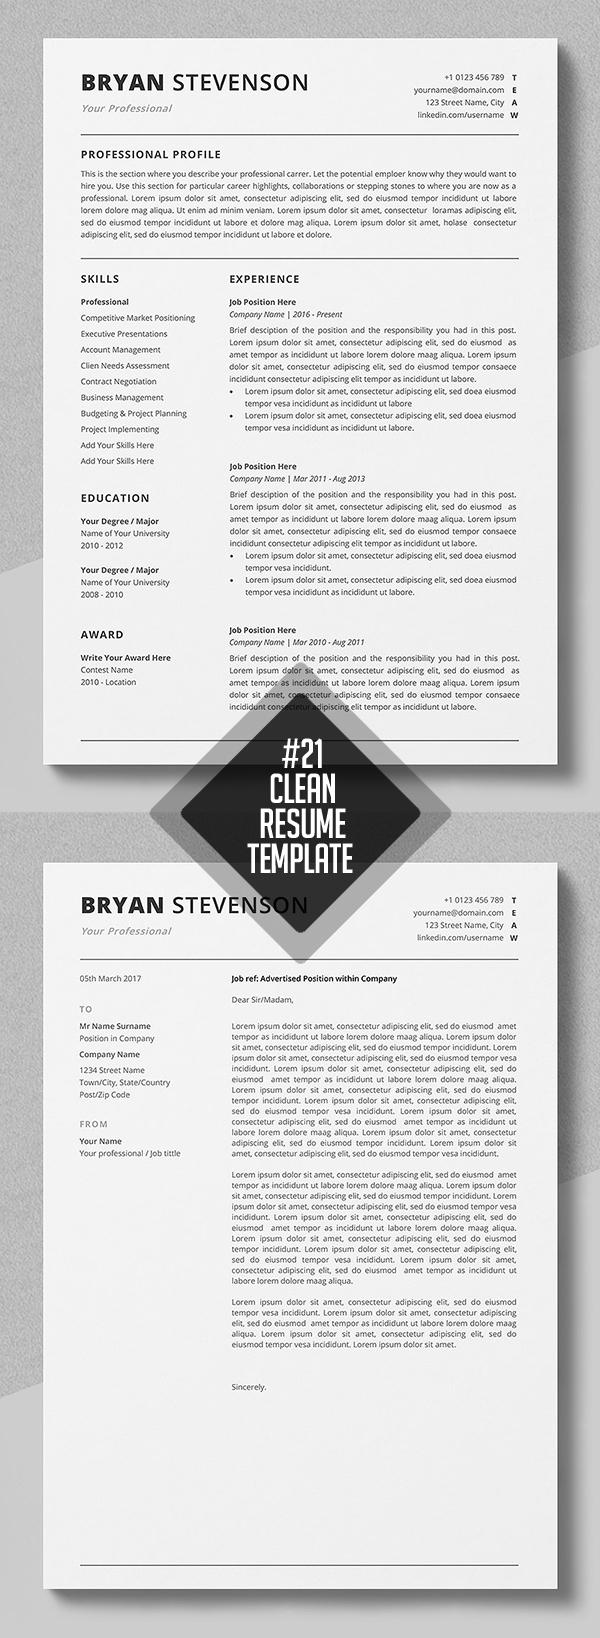 Professional Resume / CV Template